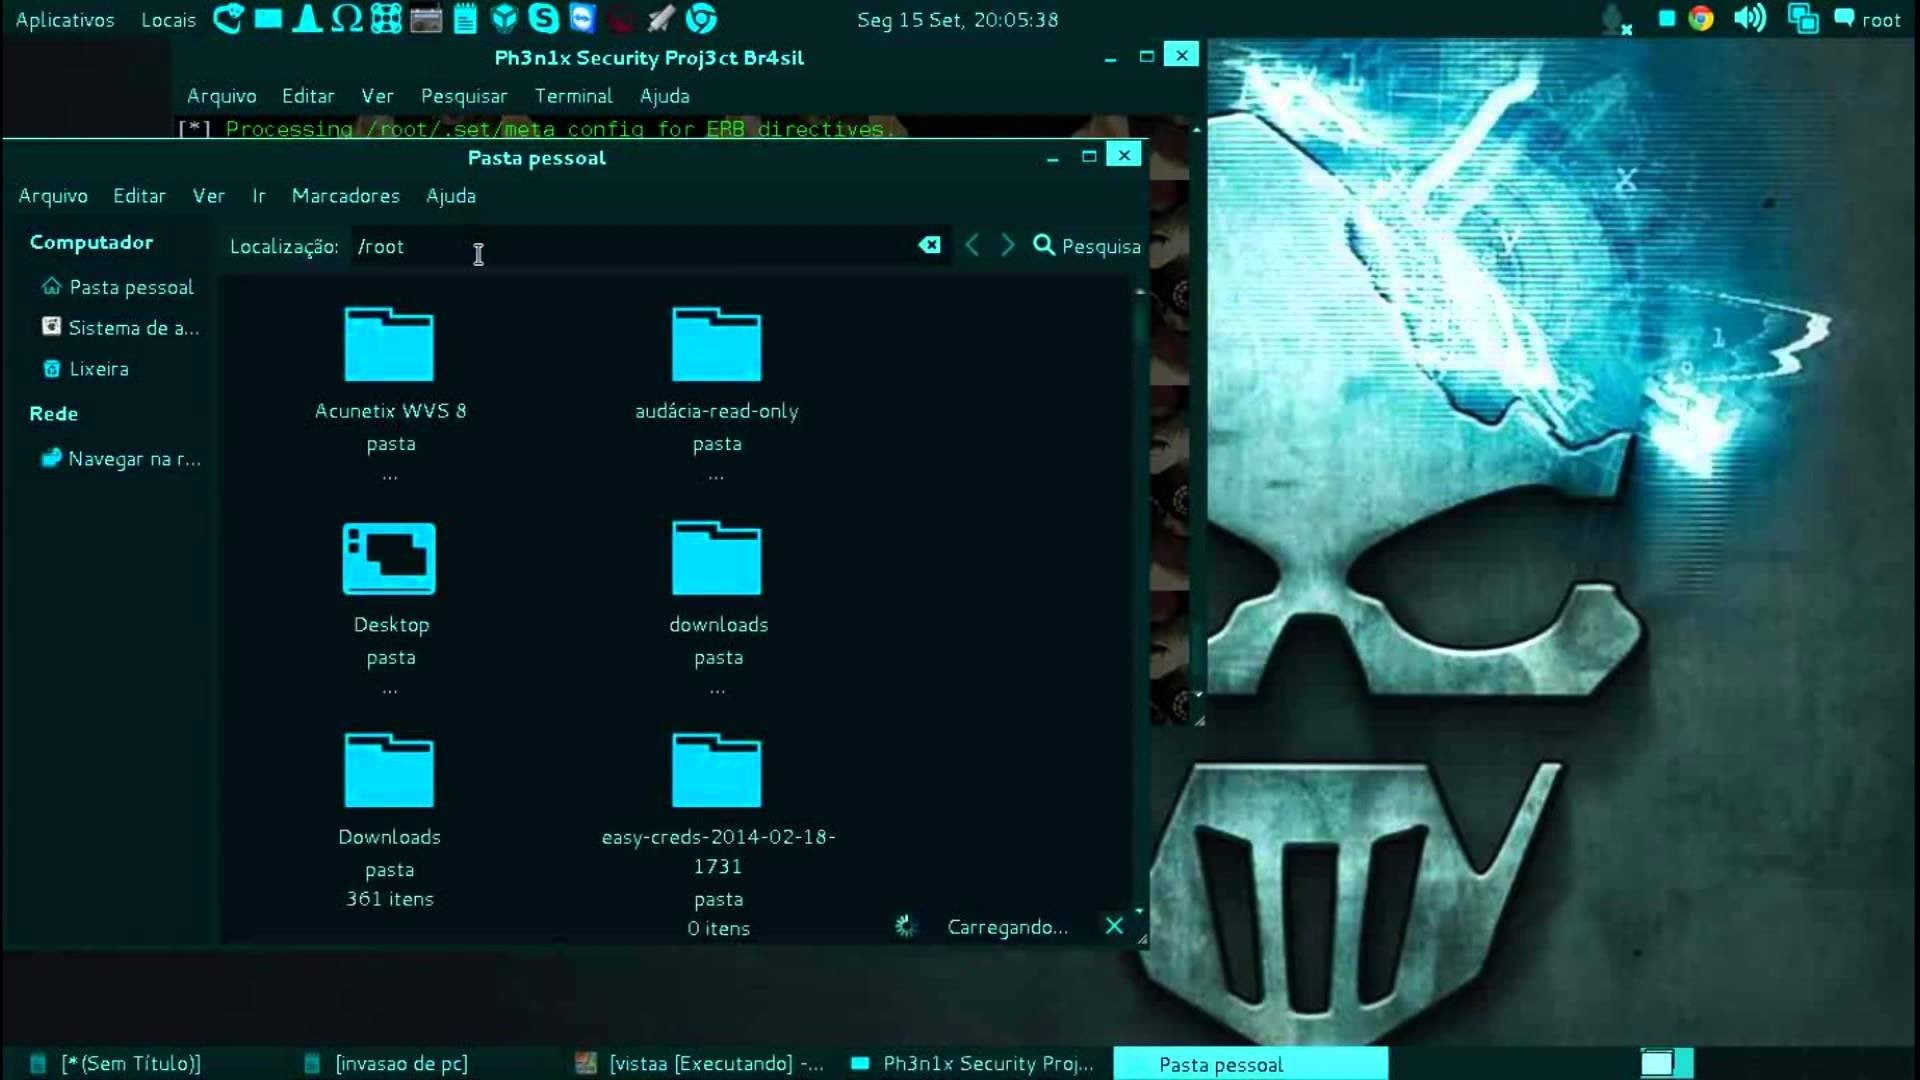 Linux Mint Wallpaper Girl Kali Linux Desktop Wallpaper 72 Images